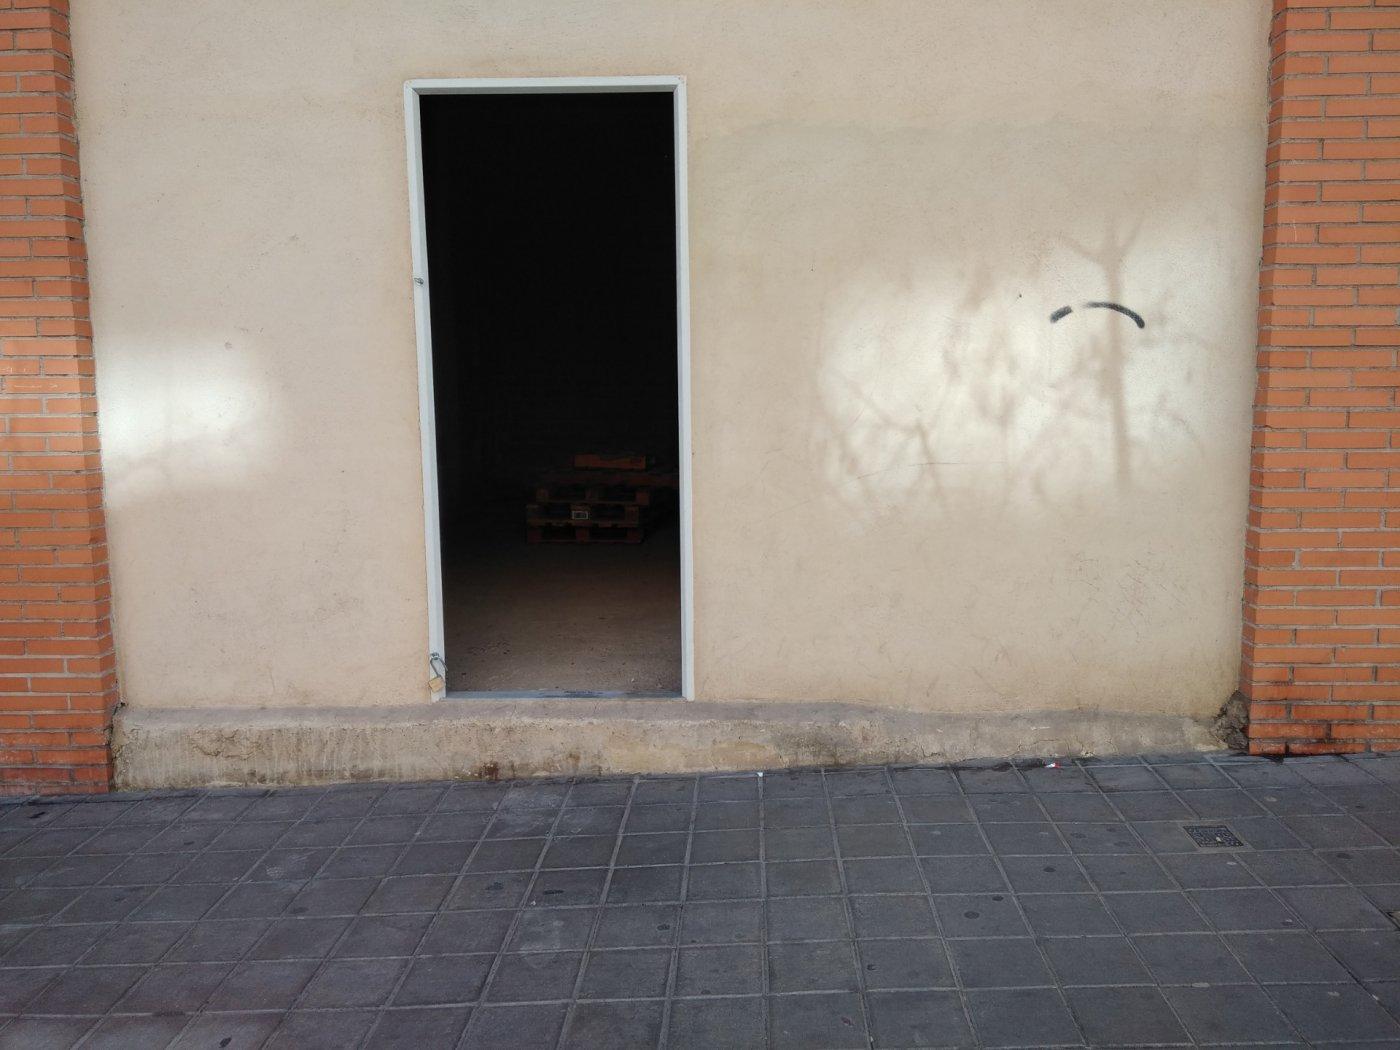 Local de SegundaMano en Altozano Campoamor Alicante